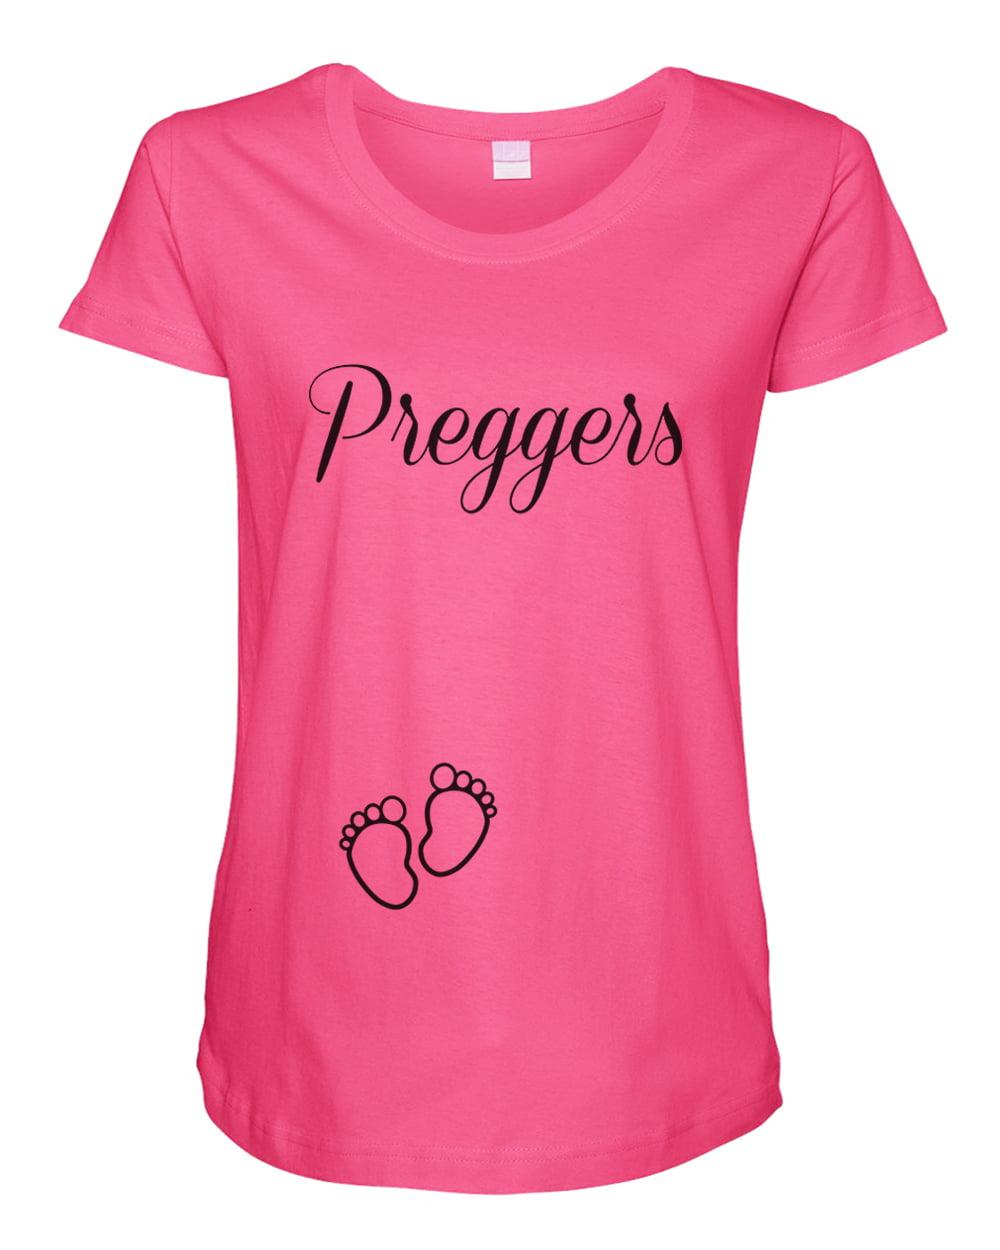 Funny Threadz Womens Pregnant Tank Top Preggers Maternity Clothes For Young Moms Xx Large Hot Pink Walmart Com Walmart Com